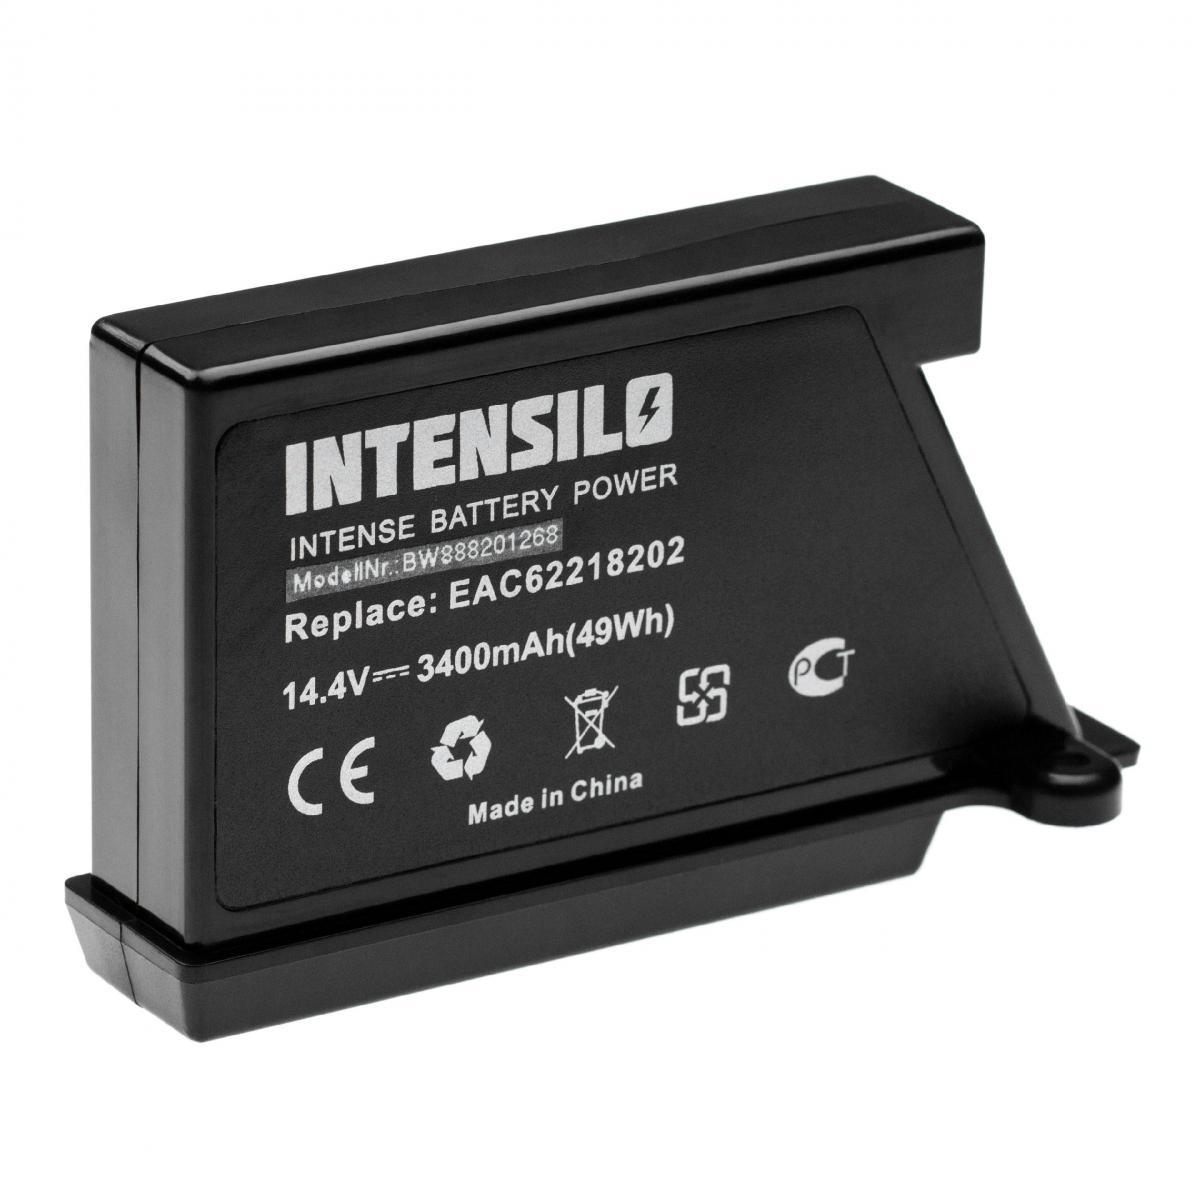 Vhbw INTENSILO Batterie compatible avec LG HOM-BOT VR6270LVMB, VR63409LV, VR6340LV robot électroménager (3400mAh, 14,4V, Li-i